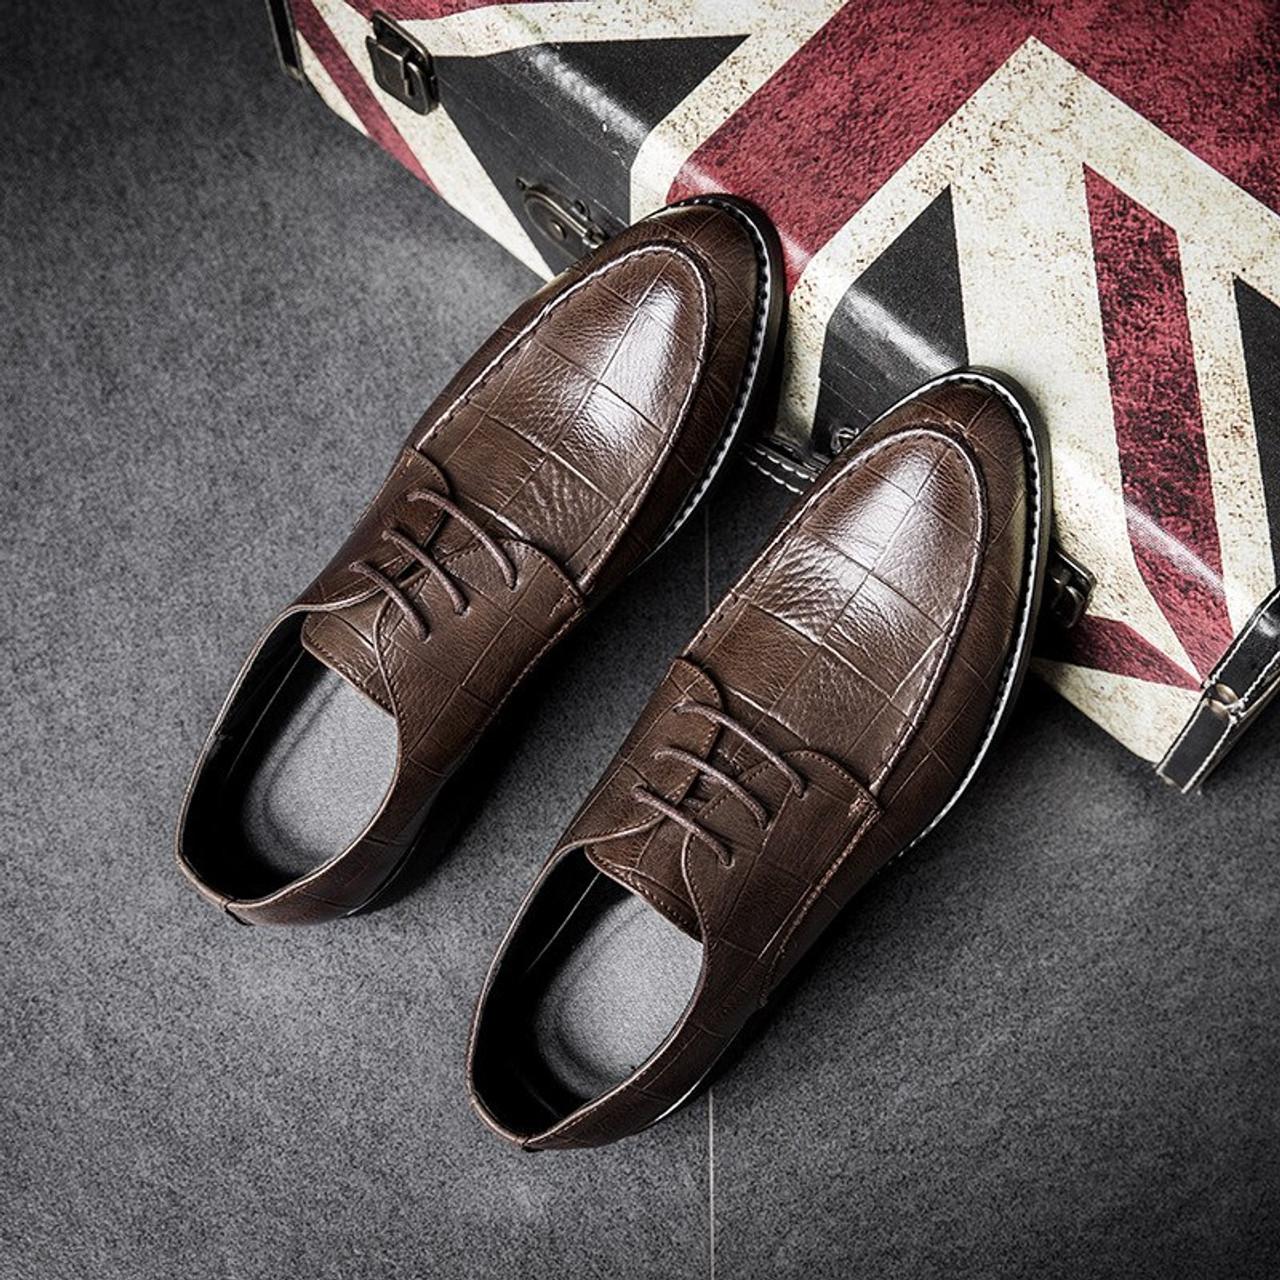 b9ceb80131d ... 2018 Ltalian Luxury Designer Formal Mens Dress Shoes Genuine Leather  Black Basic Flats For Men Wedding ...